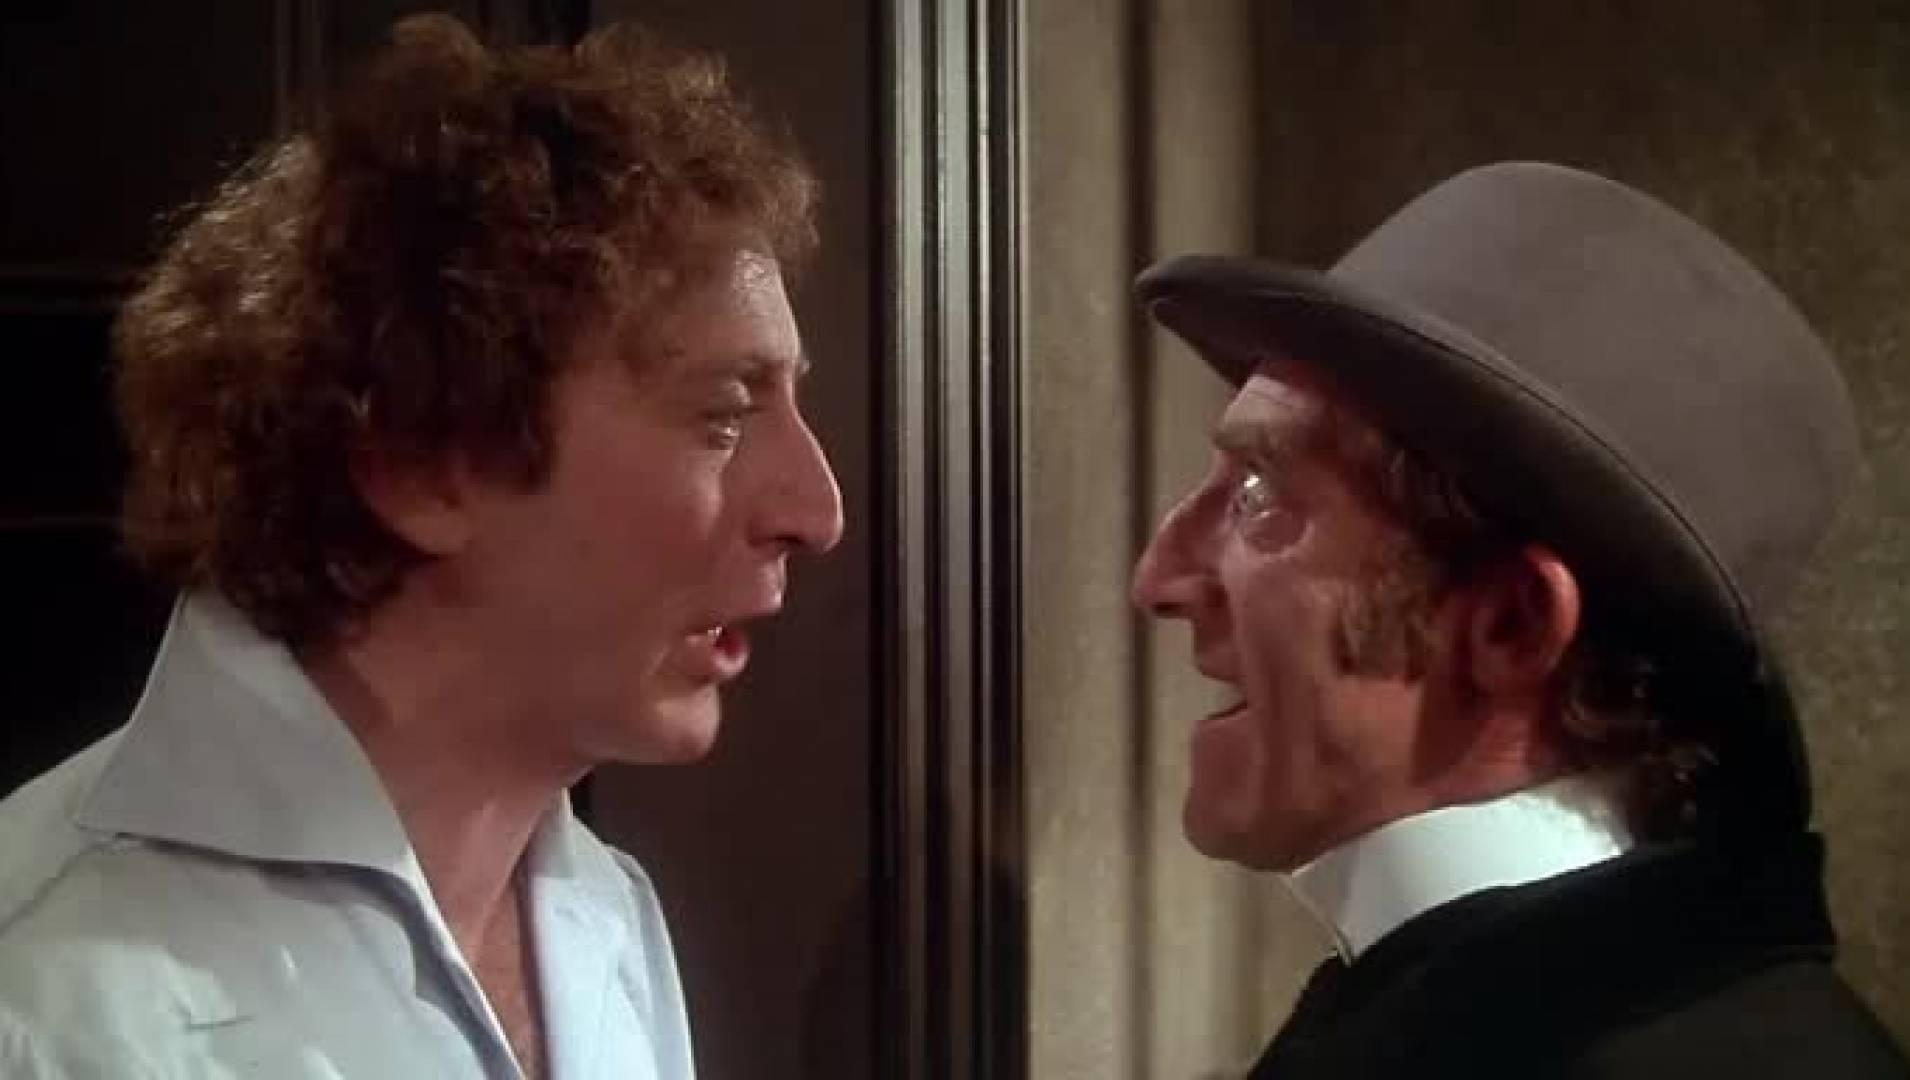 Приключения хитроумного брата Шерлока Холмса - Комедия, Фильм